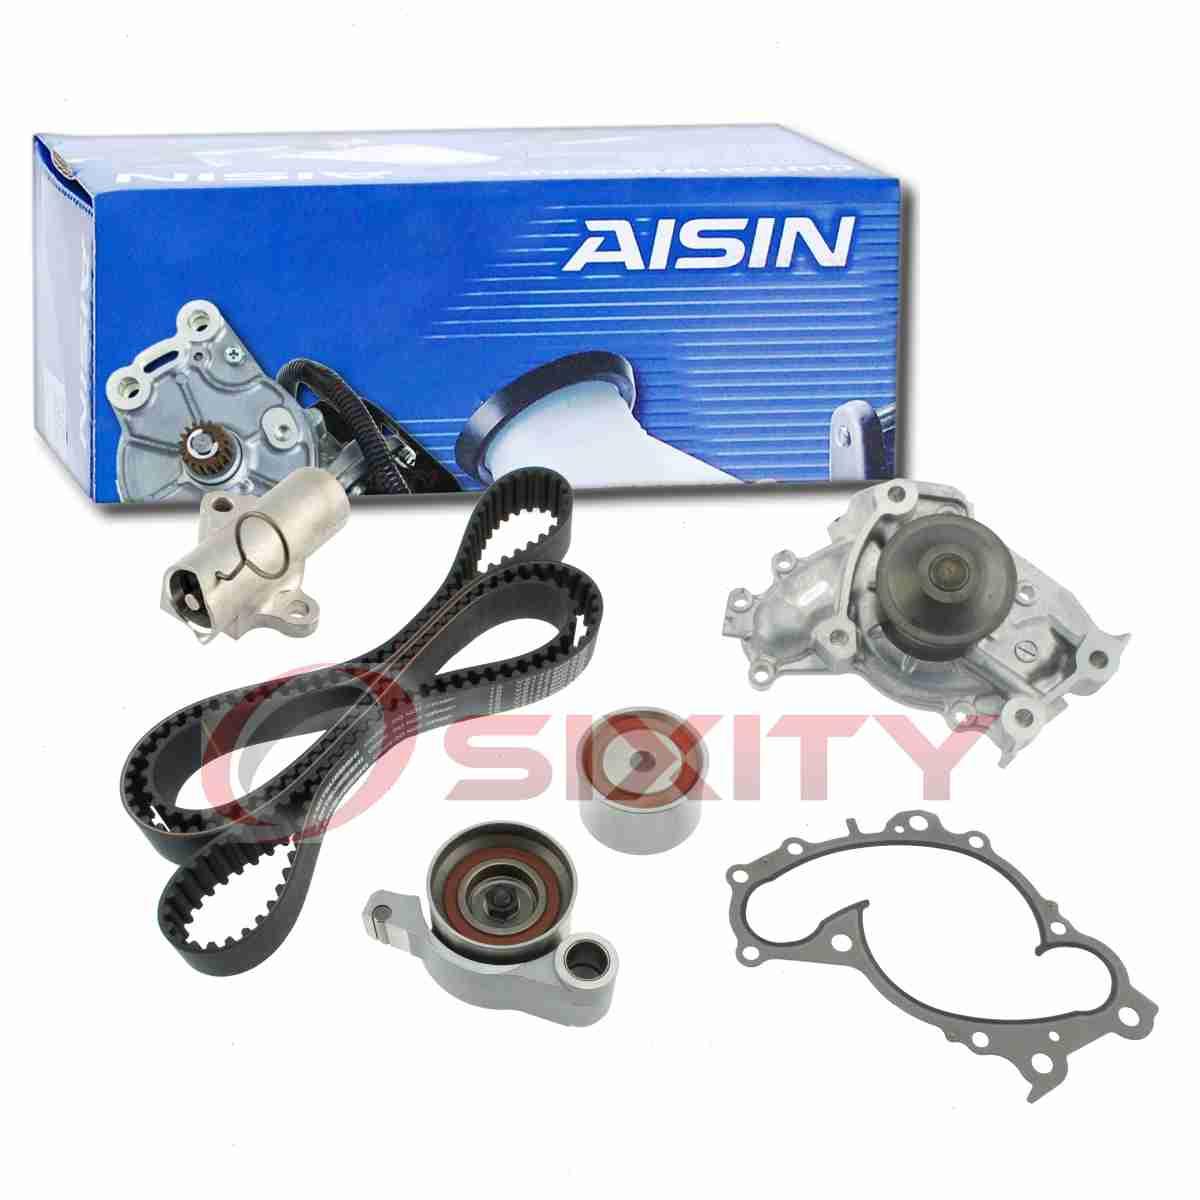 nv AISIN Timing Belt Kit w// Water Pump for 2006-2008 Lexus RX400h 3.3L V6